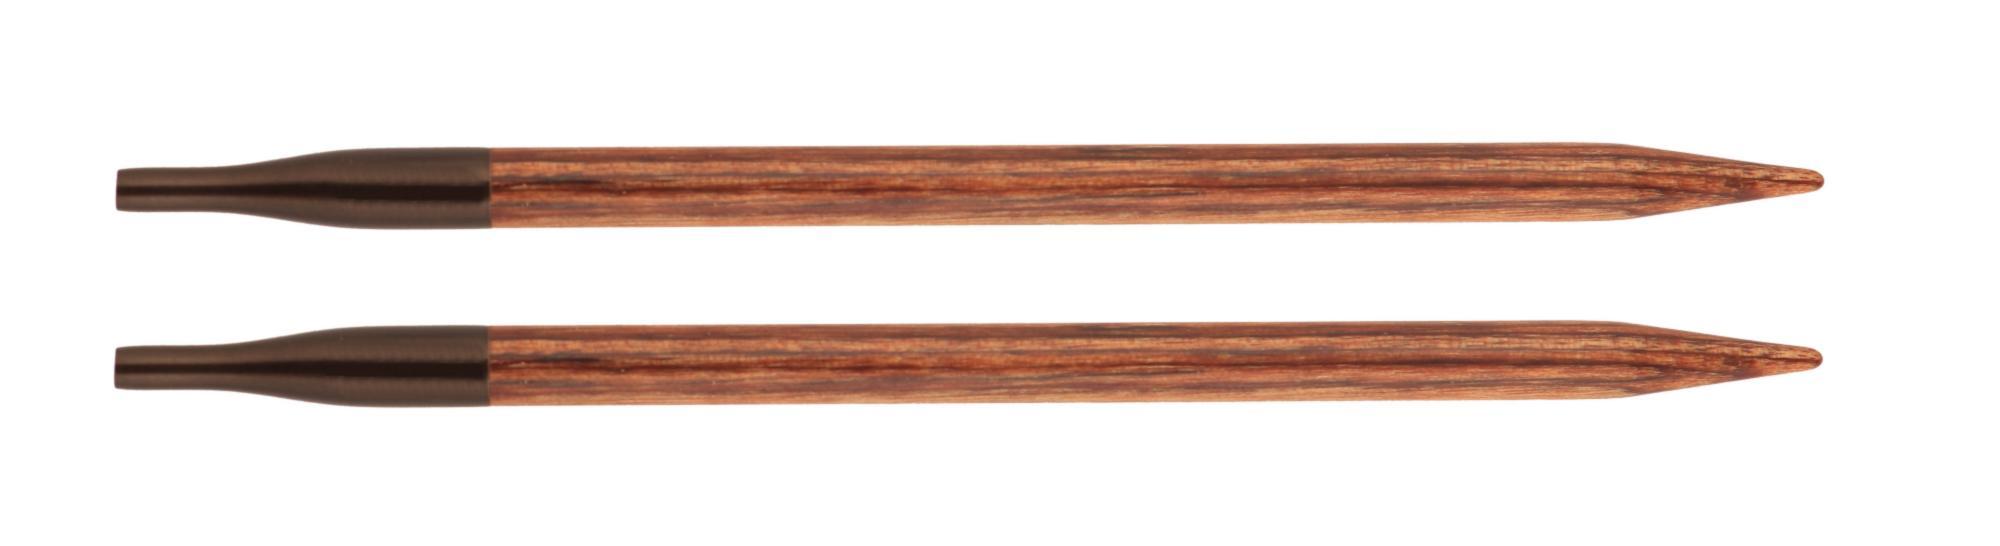 31203 Спицы съемные 3.50 мм Ginger KnitPro